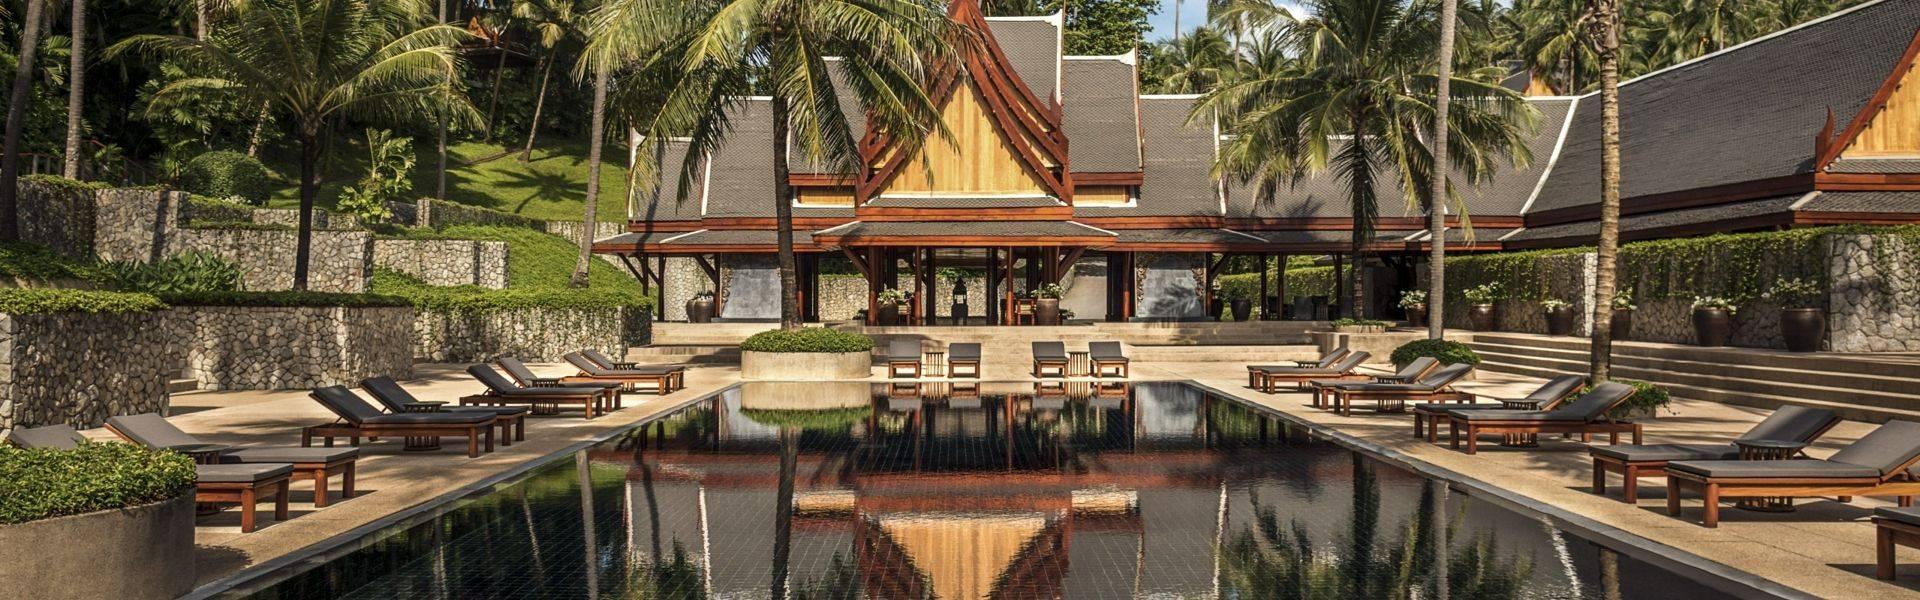 Amanpuri-pool-2.jpg